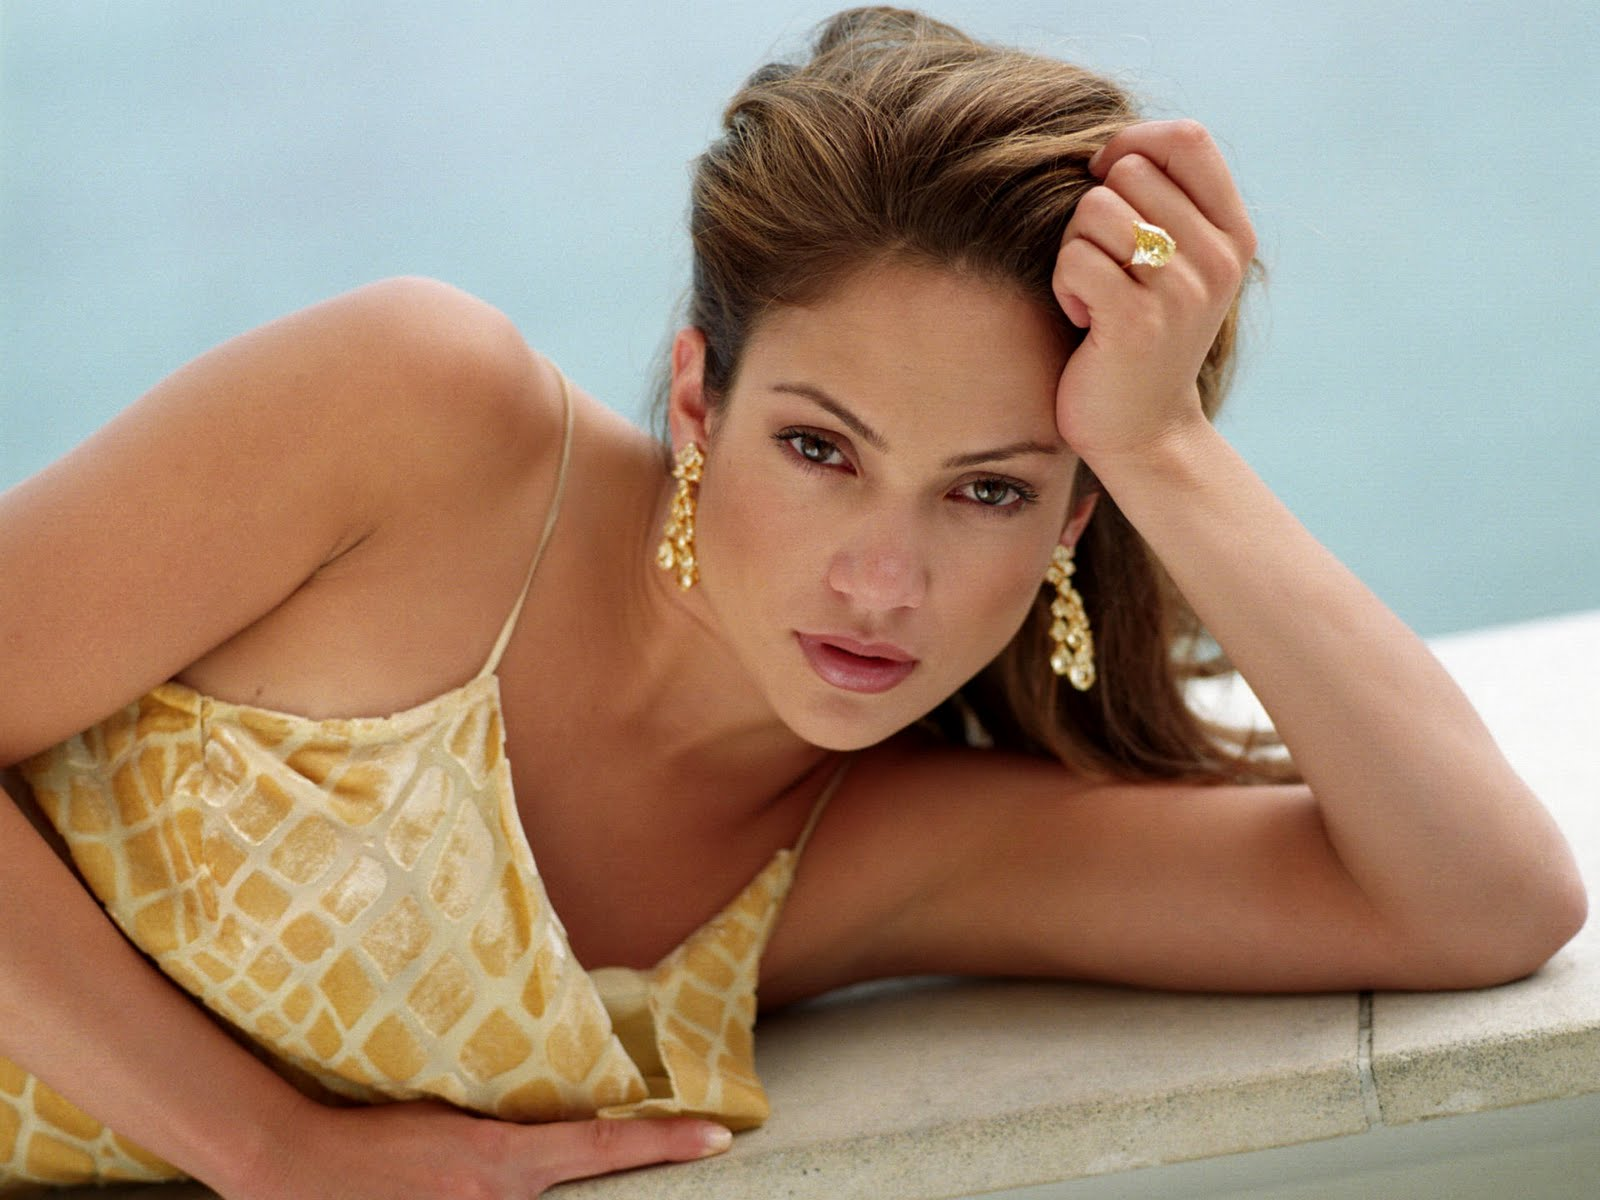 Jennifer Lopez: Jennifer Lopez USA Actress, Singer Profile,Bio And Photos